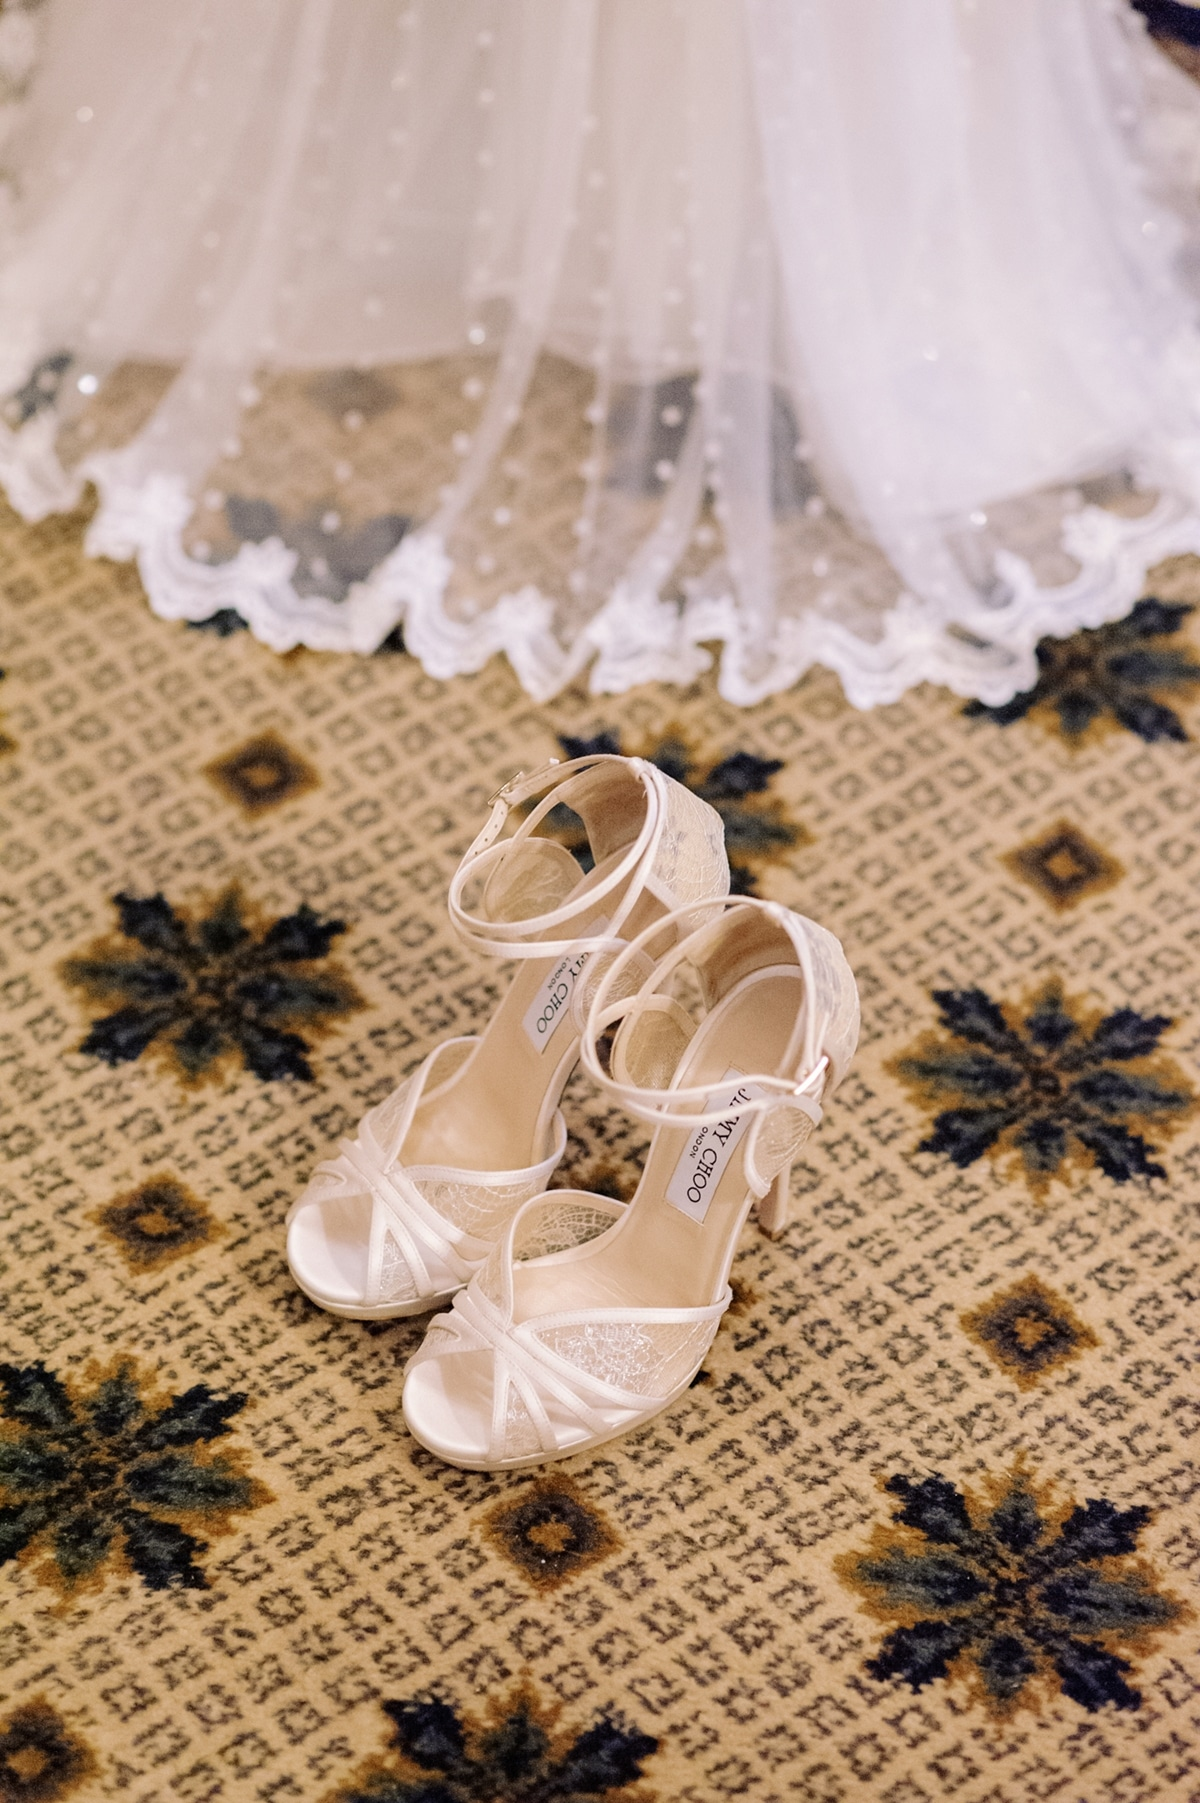 f8327699df0 Τα αγαπημένα μας Jimmy Choo νυφικά παπούτσια | WeddingTales.gr